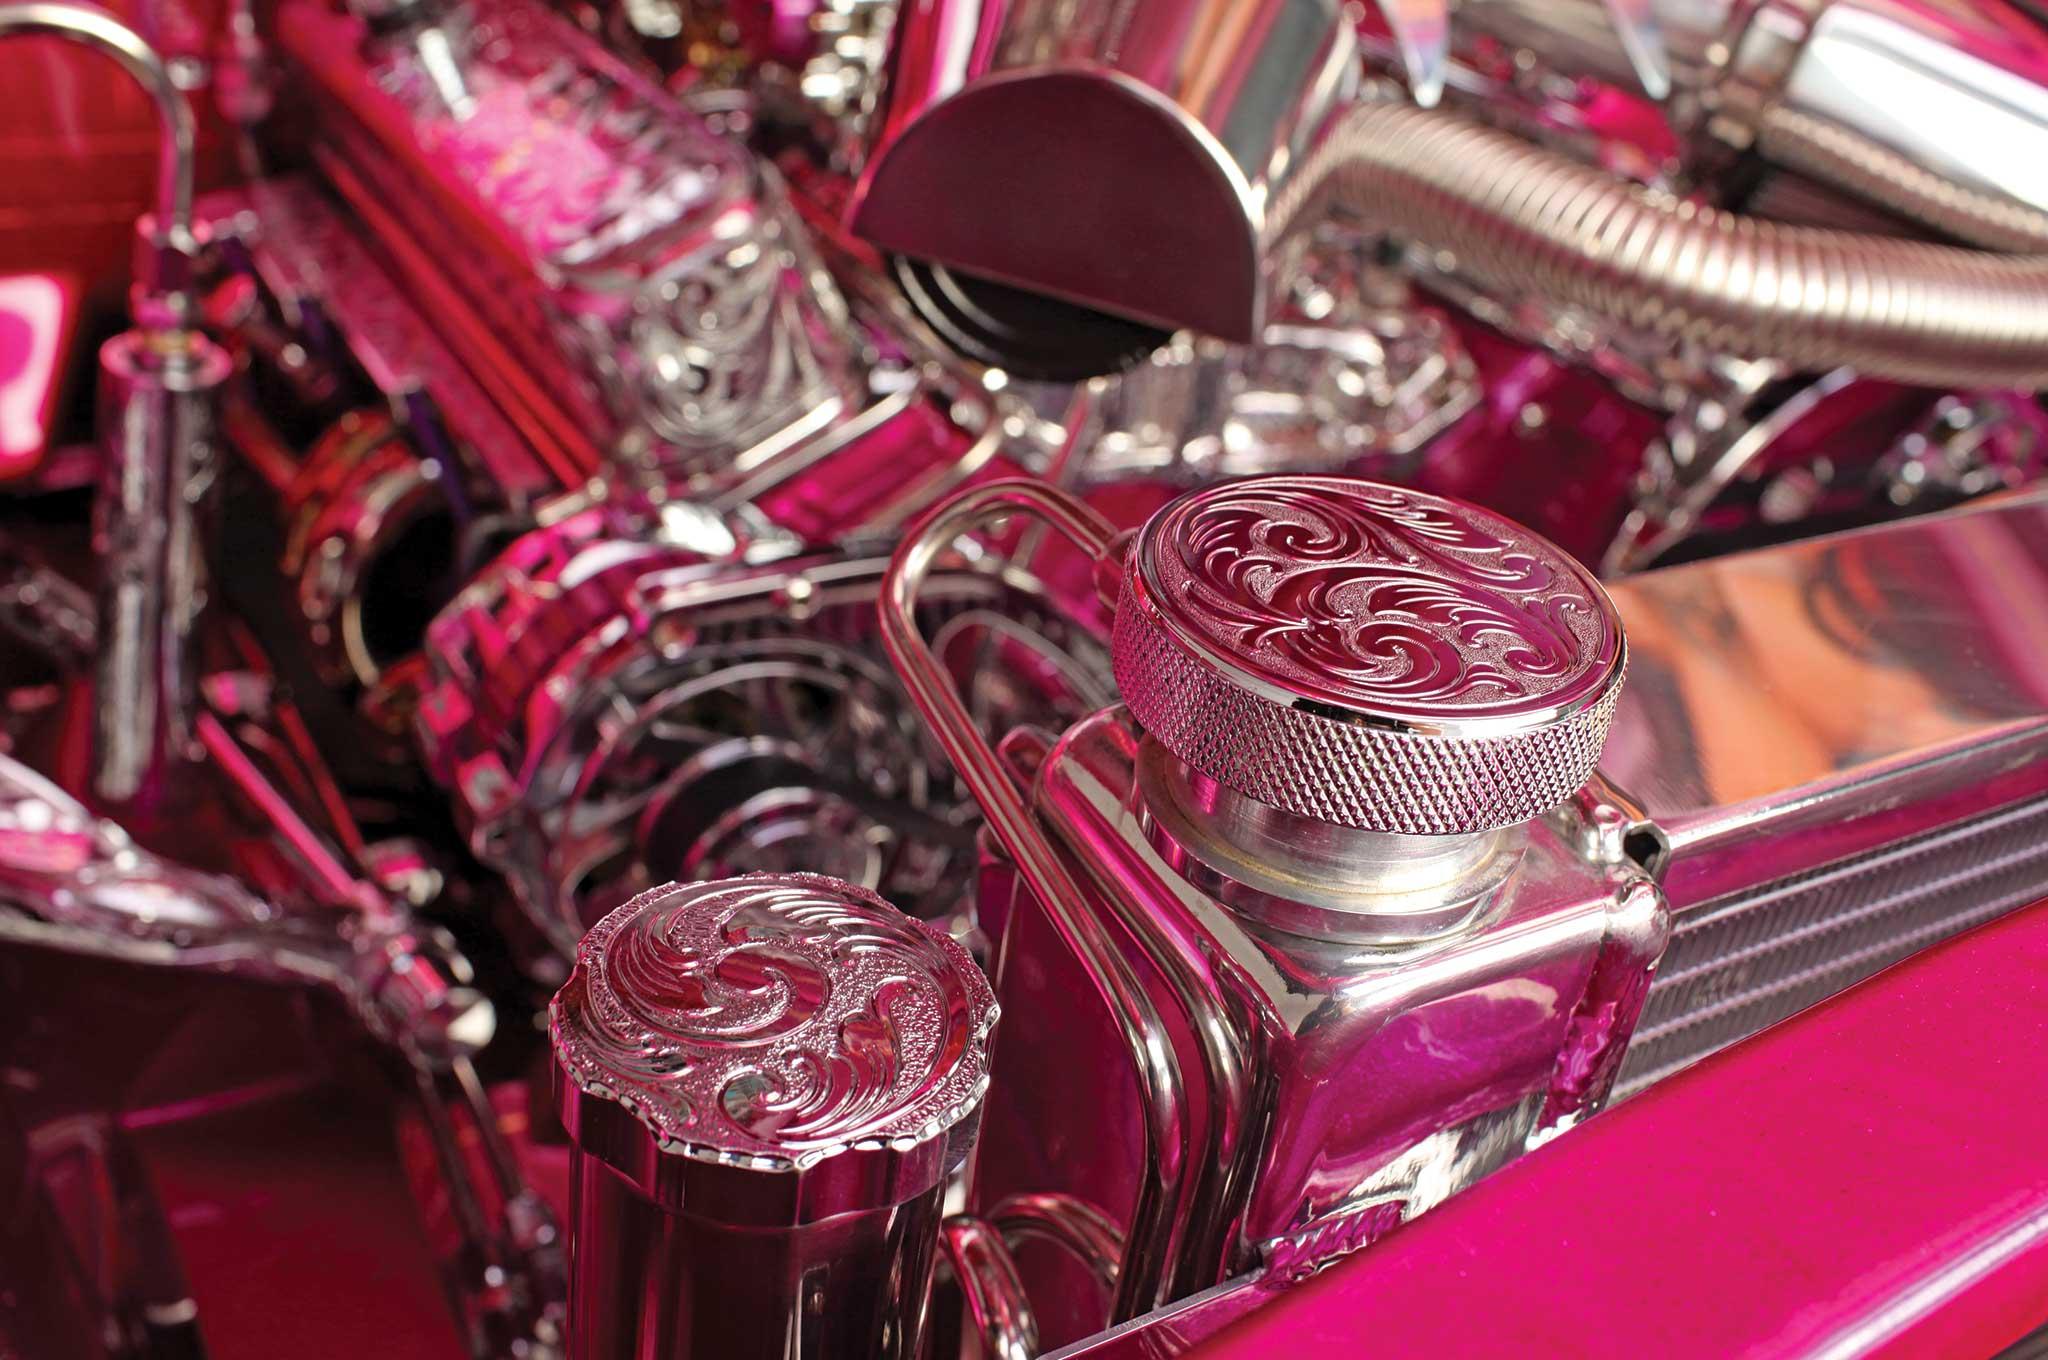 1961 chevrolet impala convertible radiator cap 010